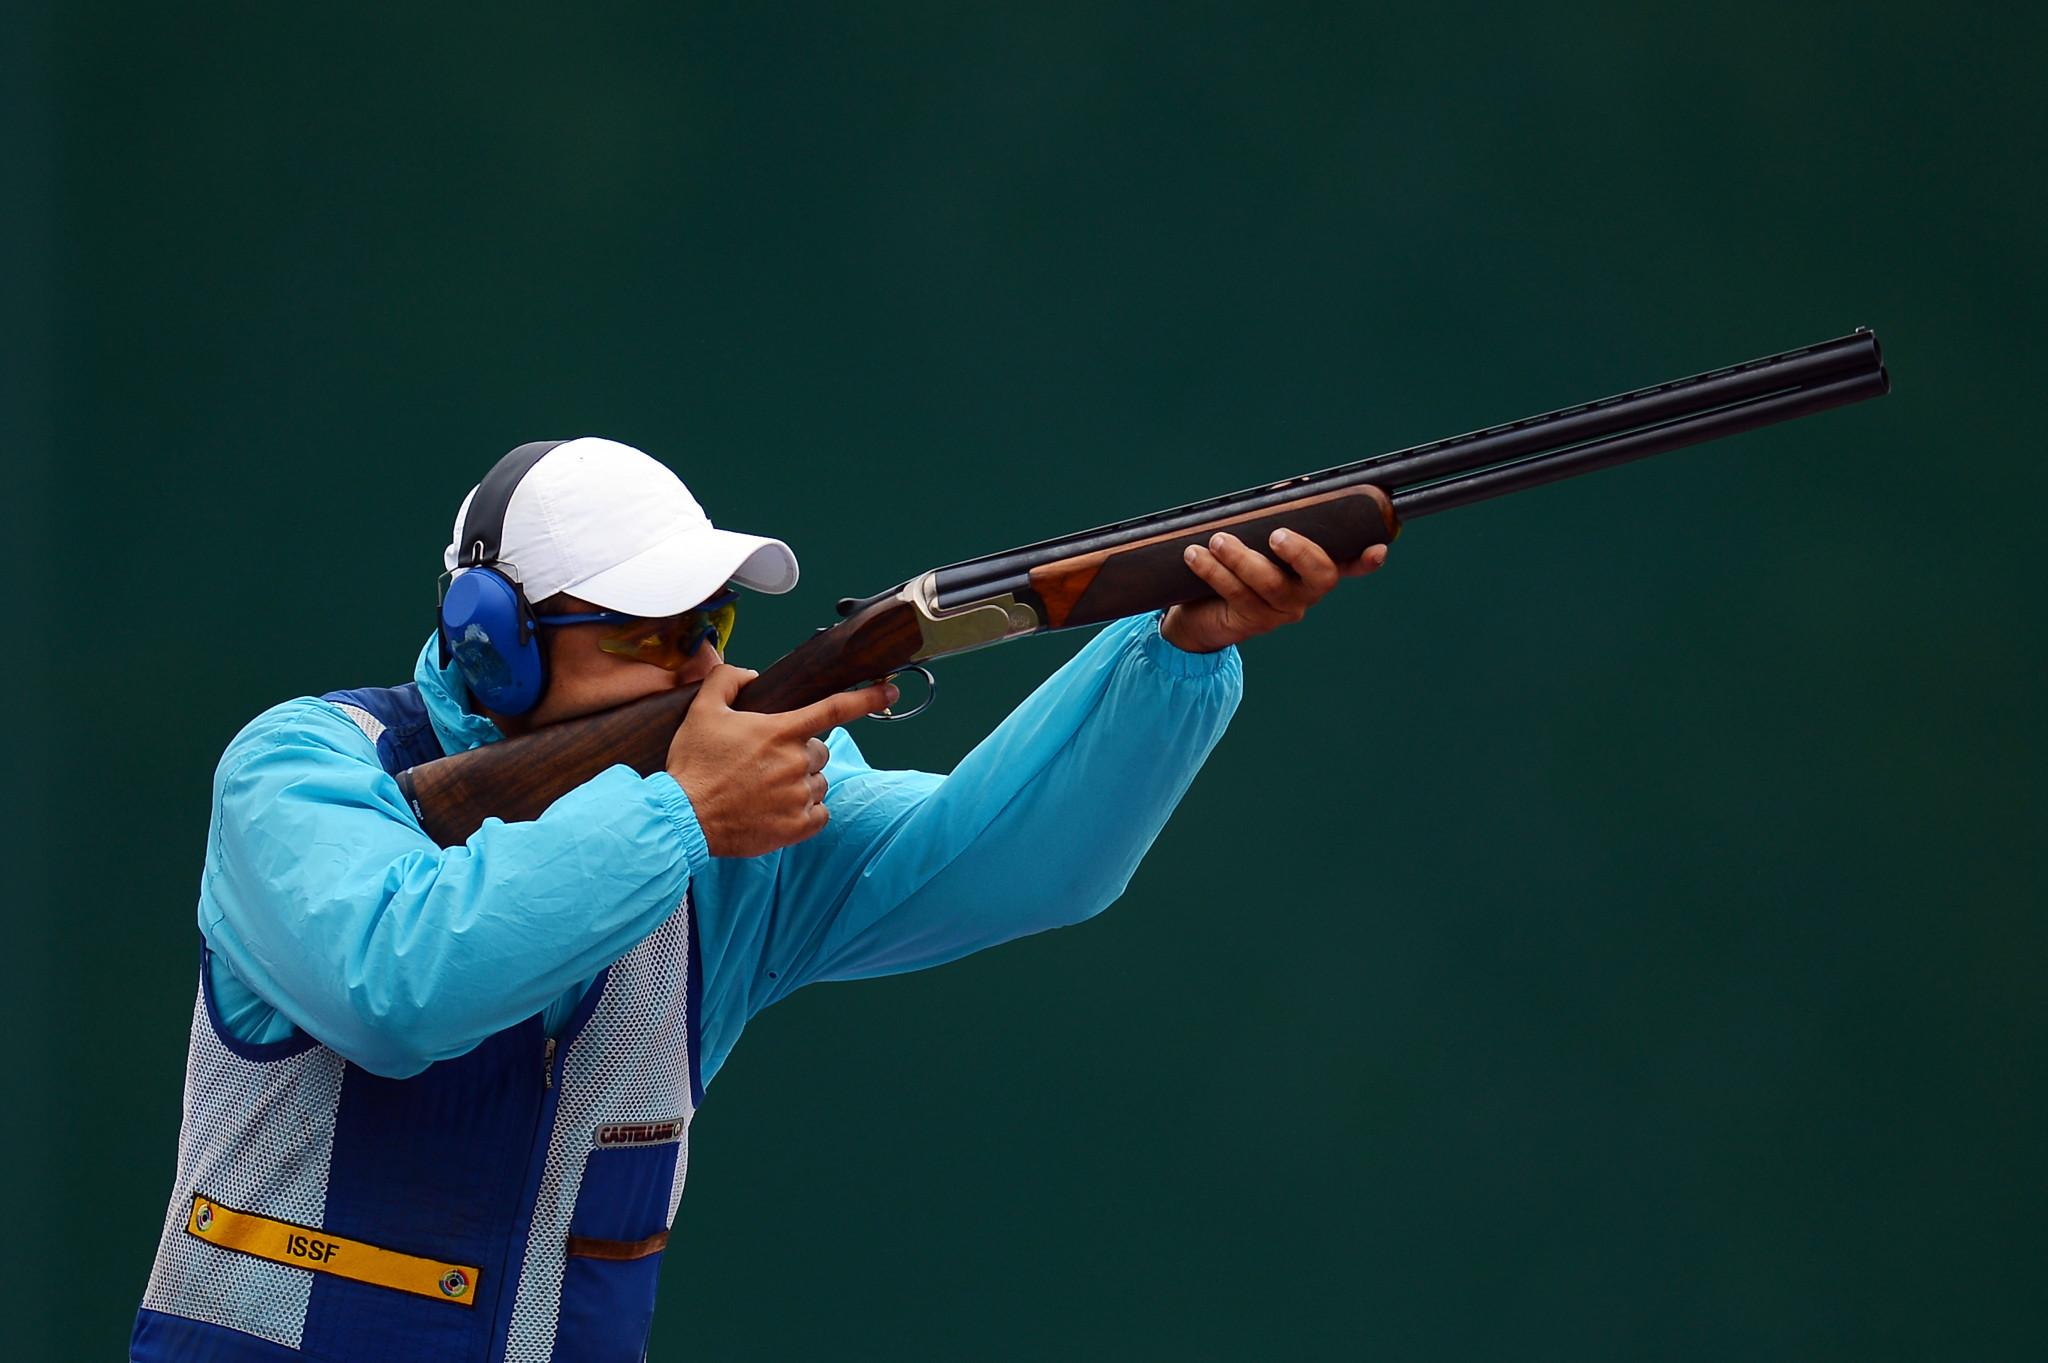 Teenager Smith wins women's skeet gold at ISSF Shotgun World Cup in Lonato